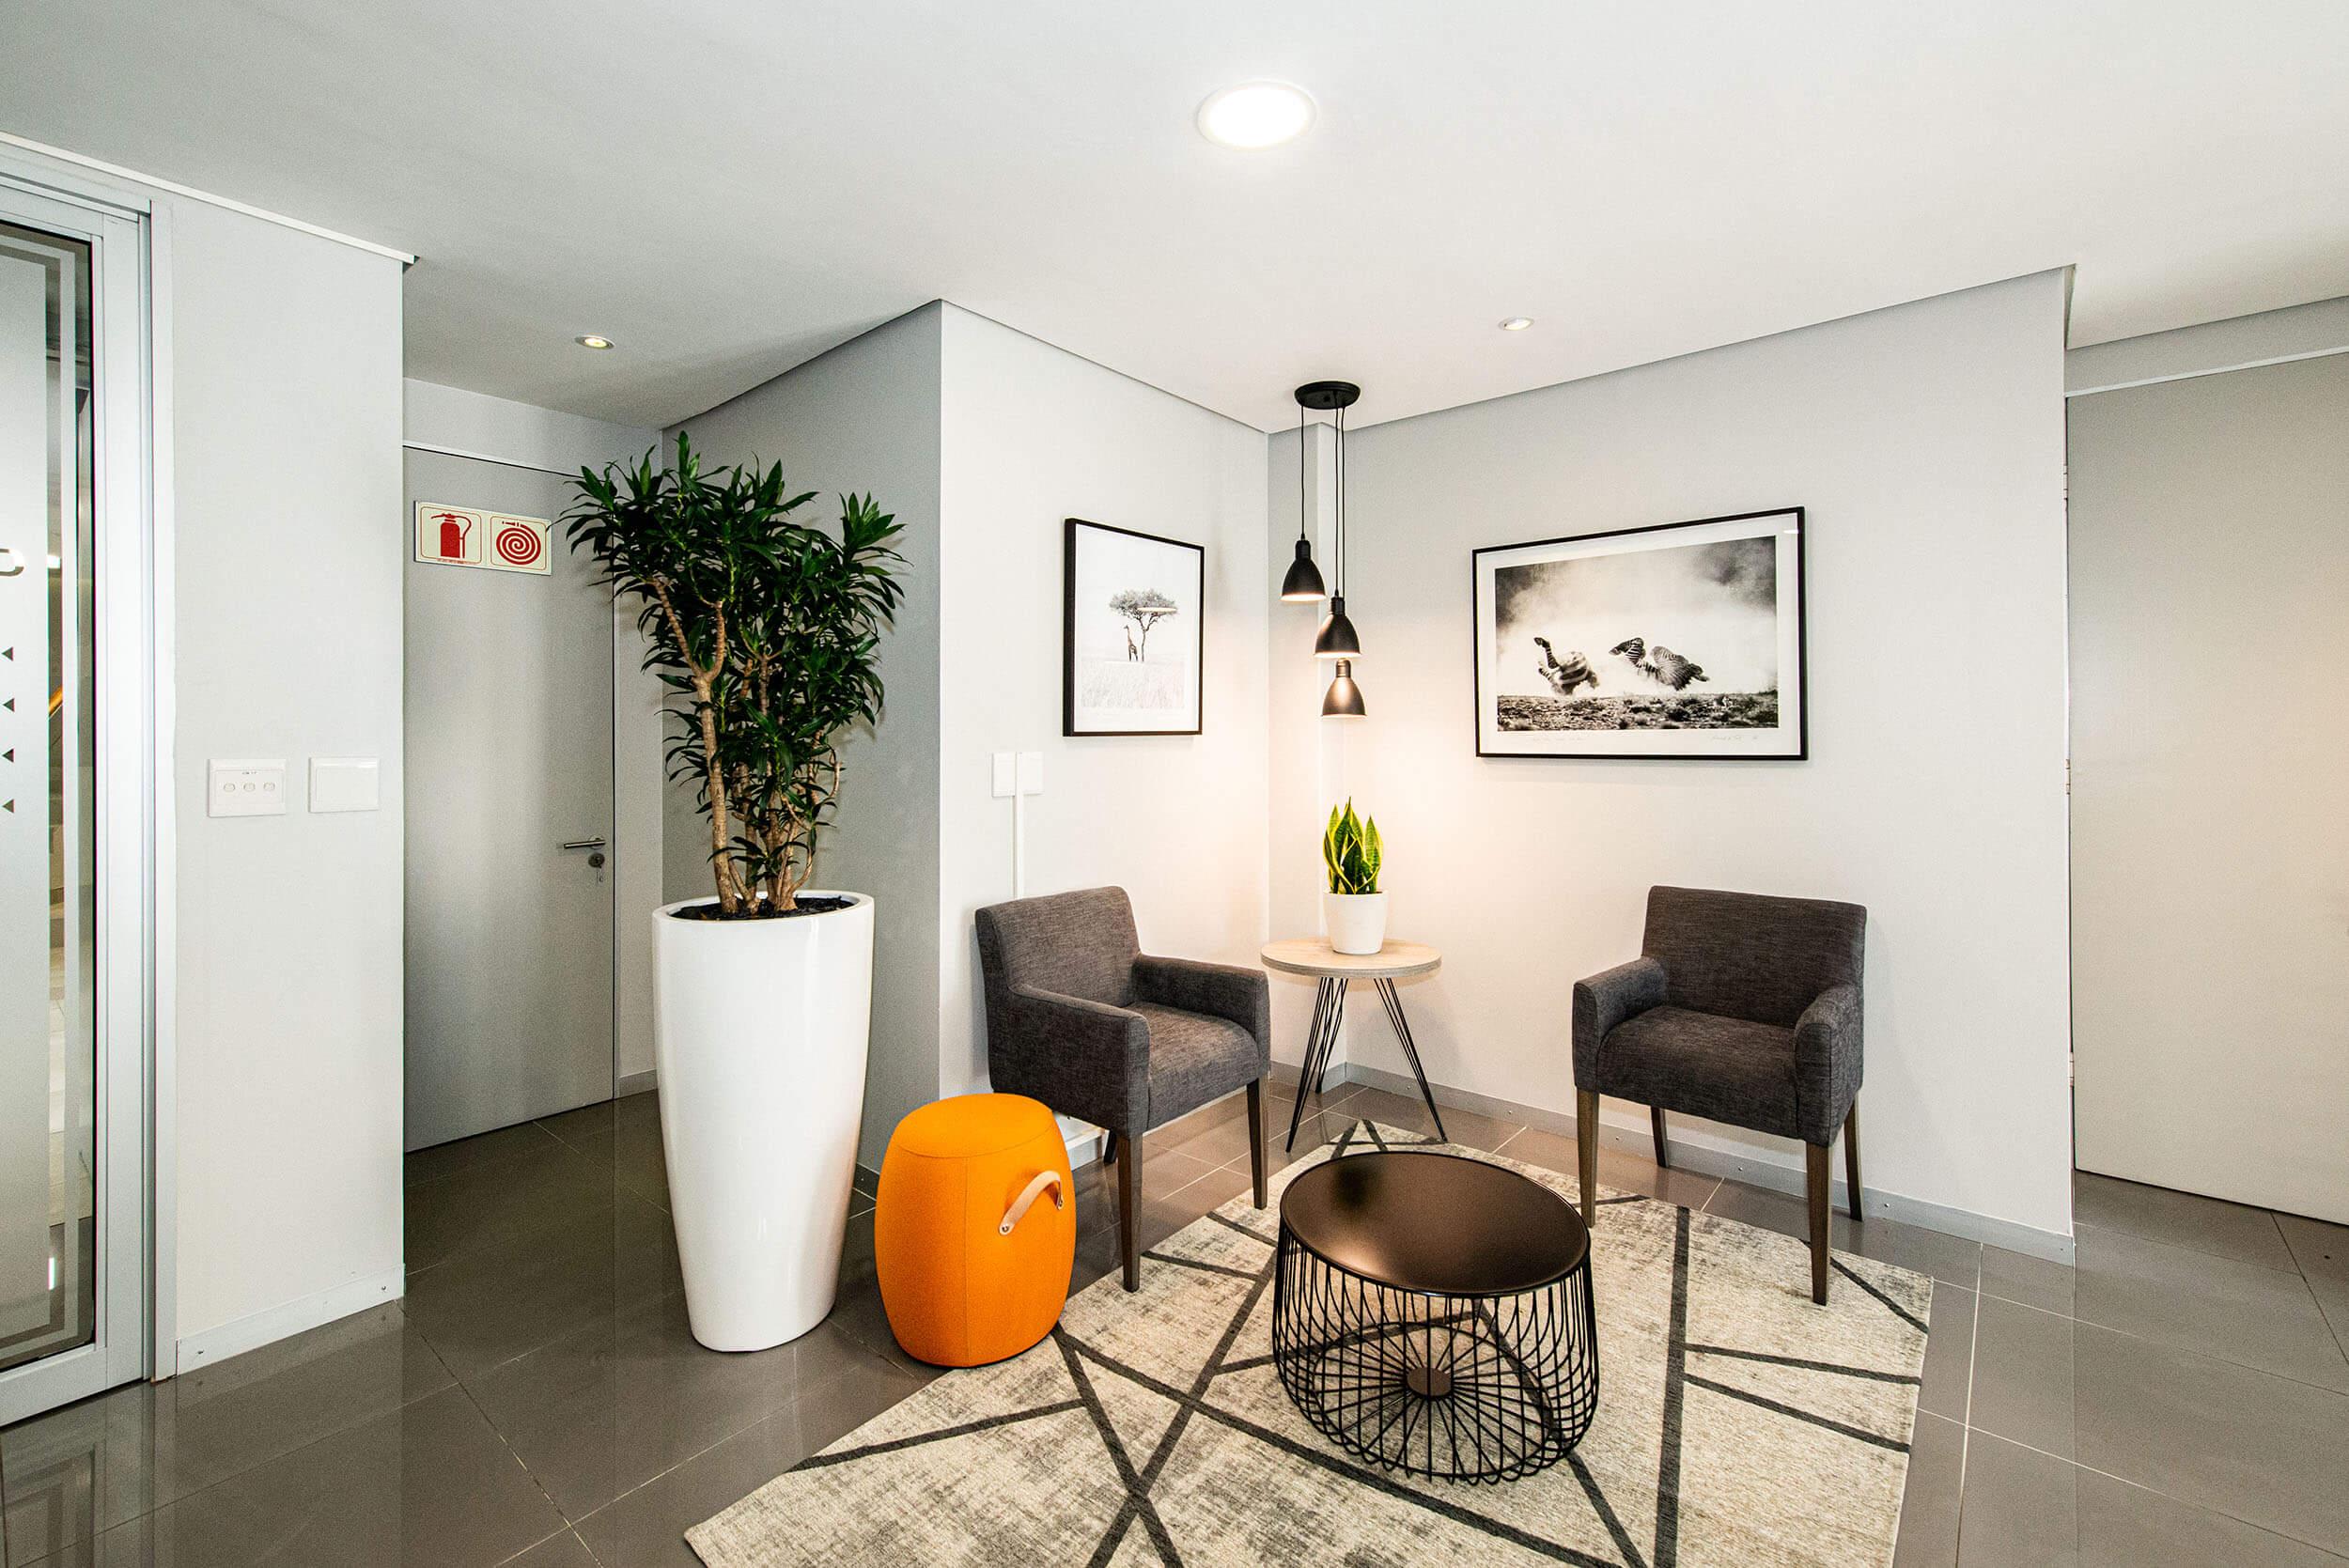 CA Global - Turnkey Interiors - Corporate Interior Design and Build